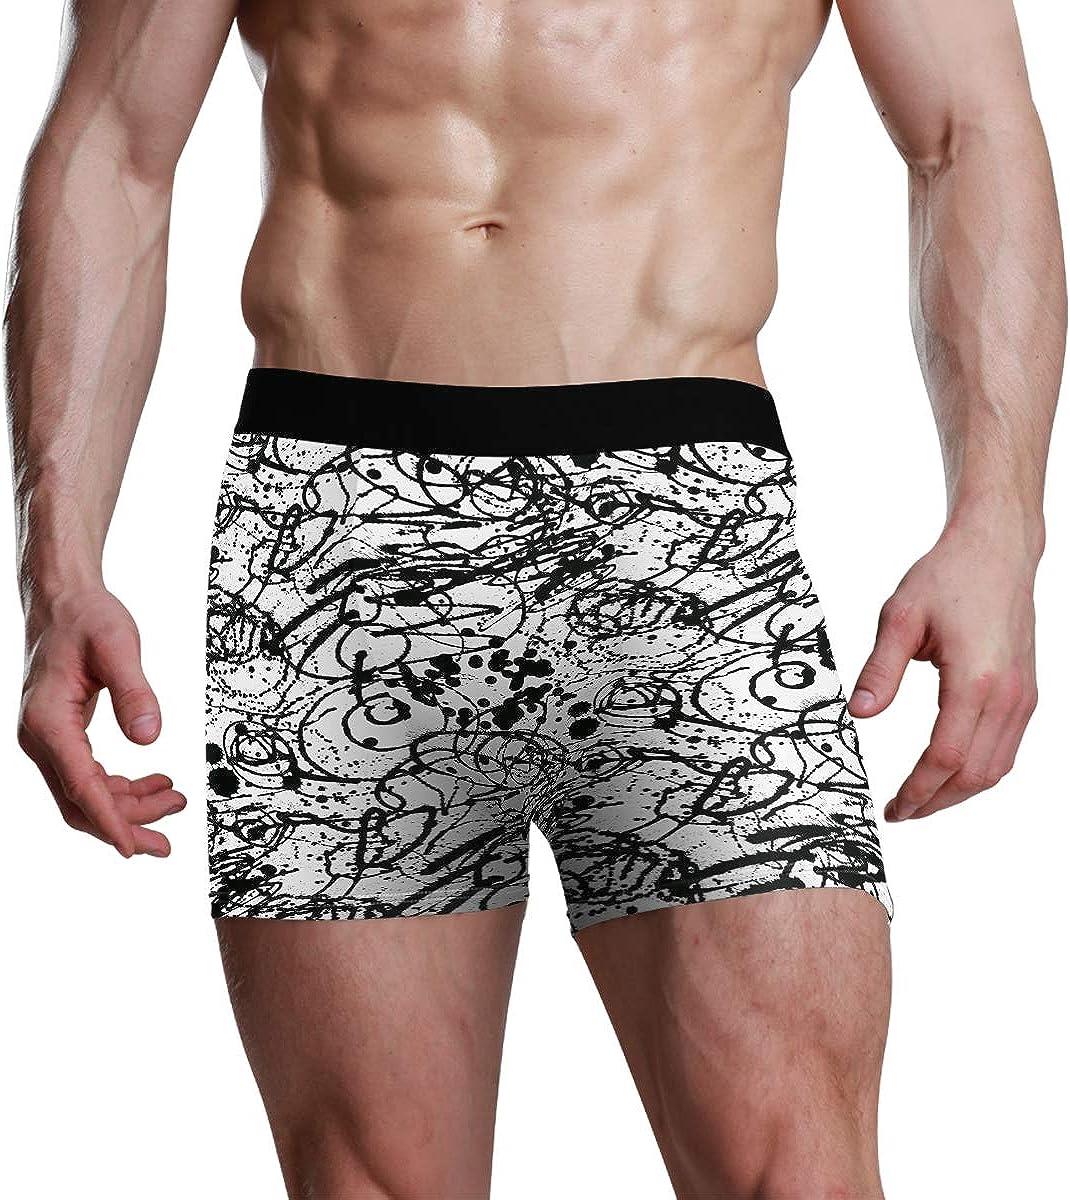 Mens Boxer Briefs Underwear Splattered with Dots Seamless Wallpaper Pattern Trunks Underwear Short Leg Boys